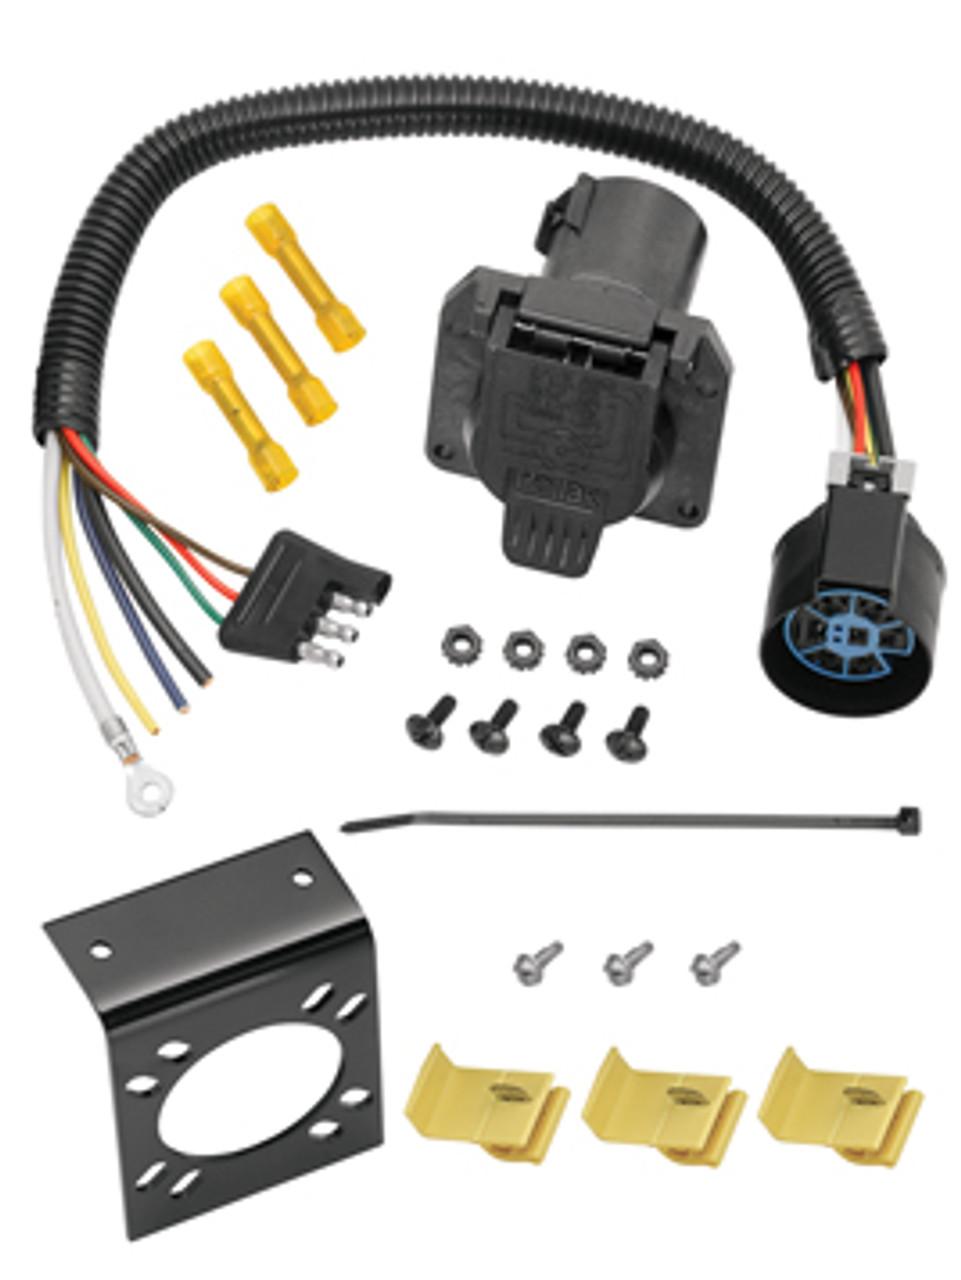 20125 --- 4-Prong Flat to 7-Way Round (Flat Pins) US car (OEM) Adapter